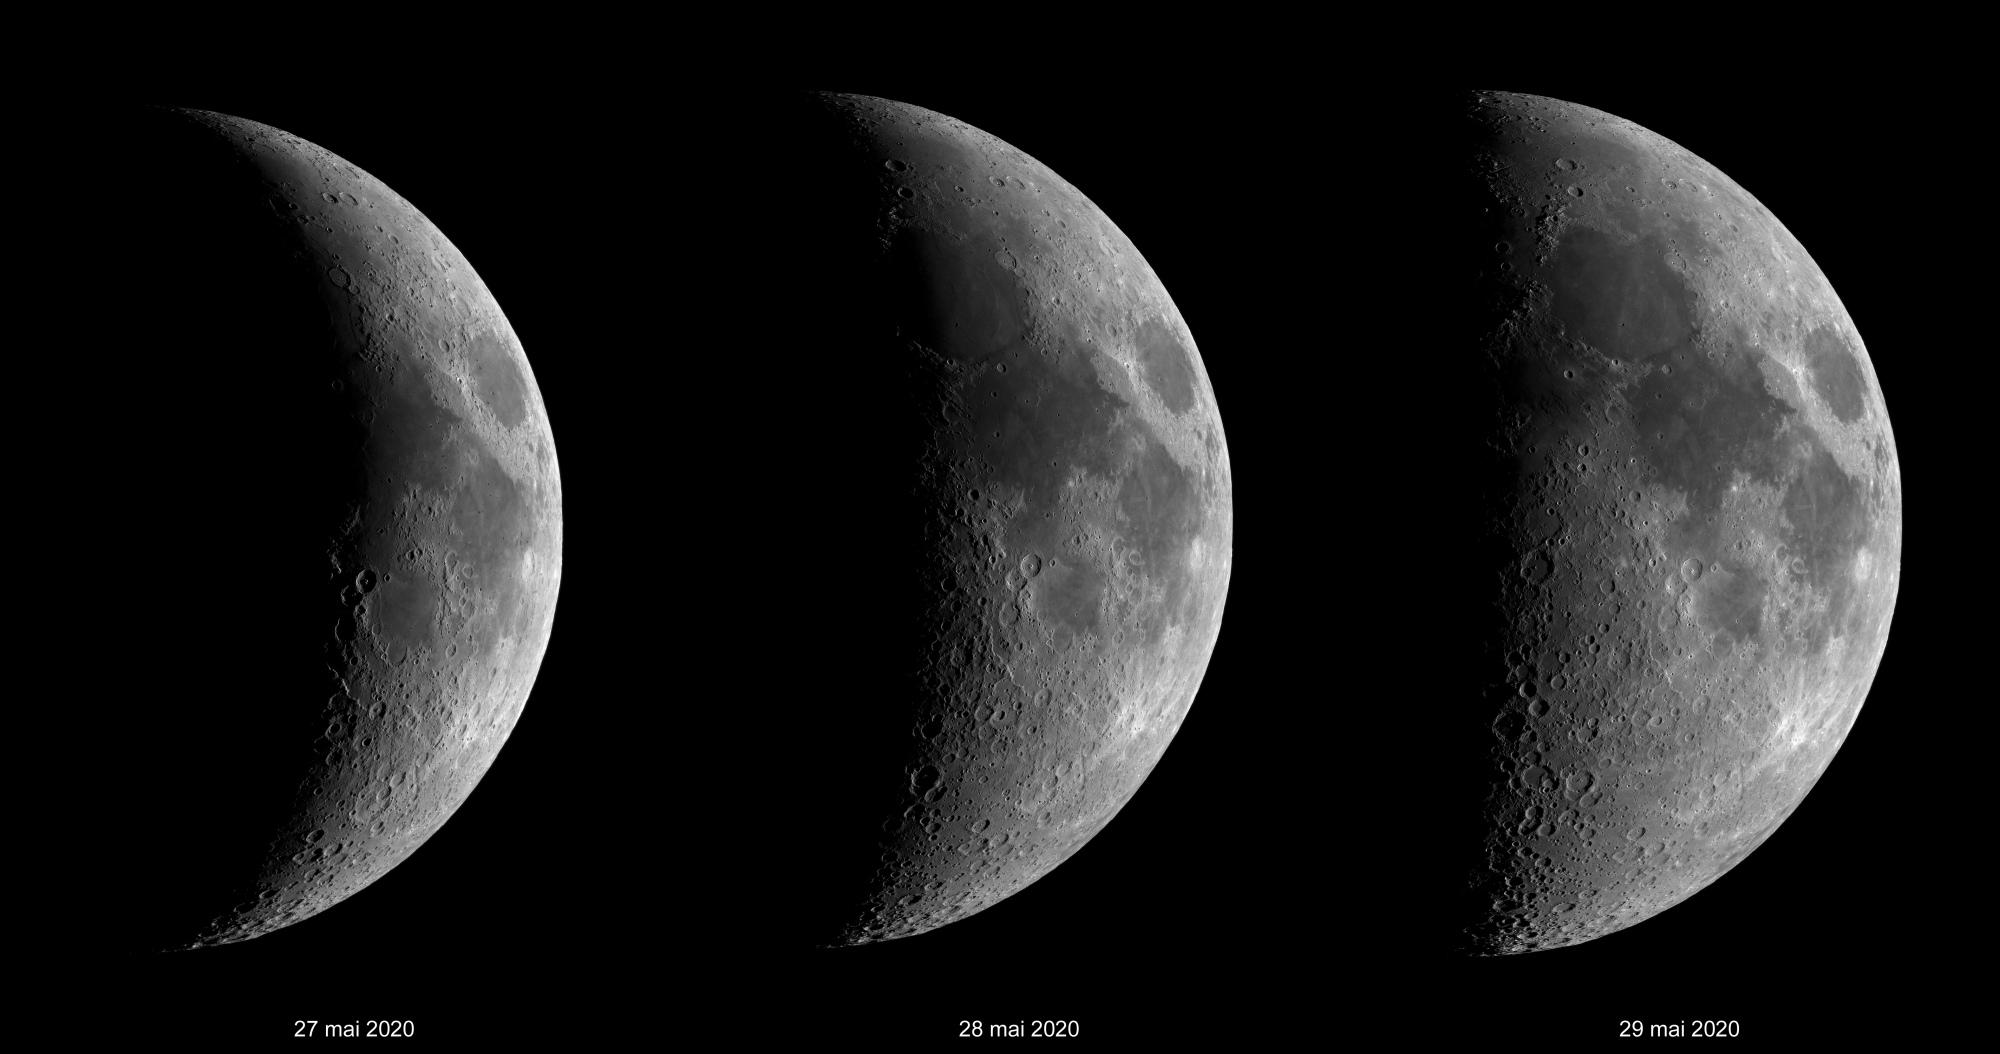 Lune-20200527_28_29-Mtg-PSm.jpg